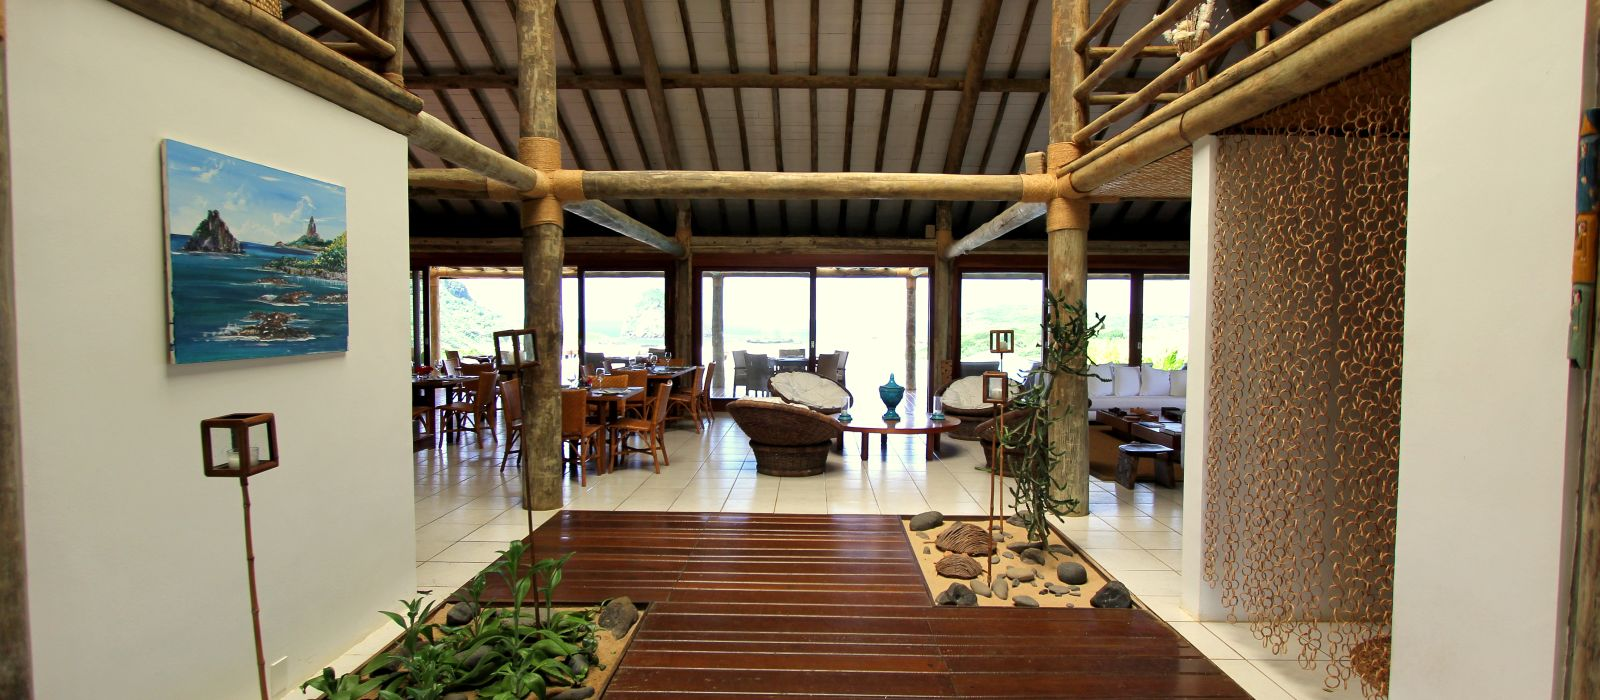 Hotel Maravilha Brazil